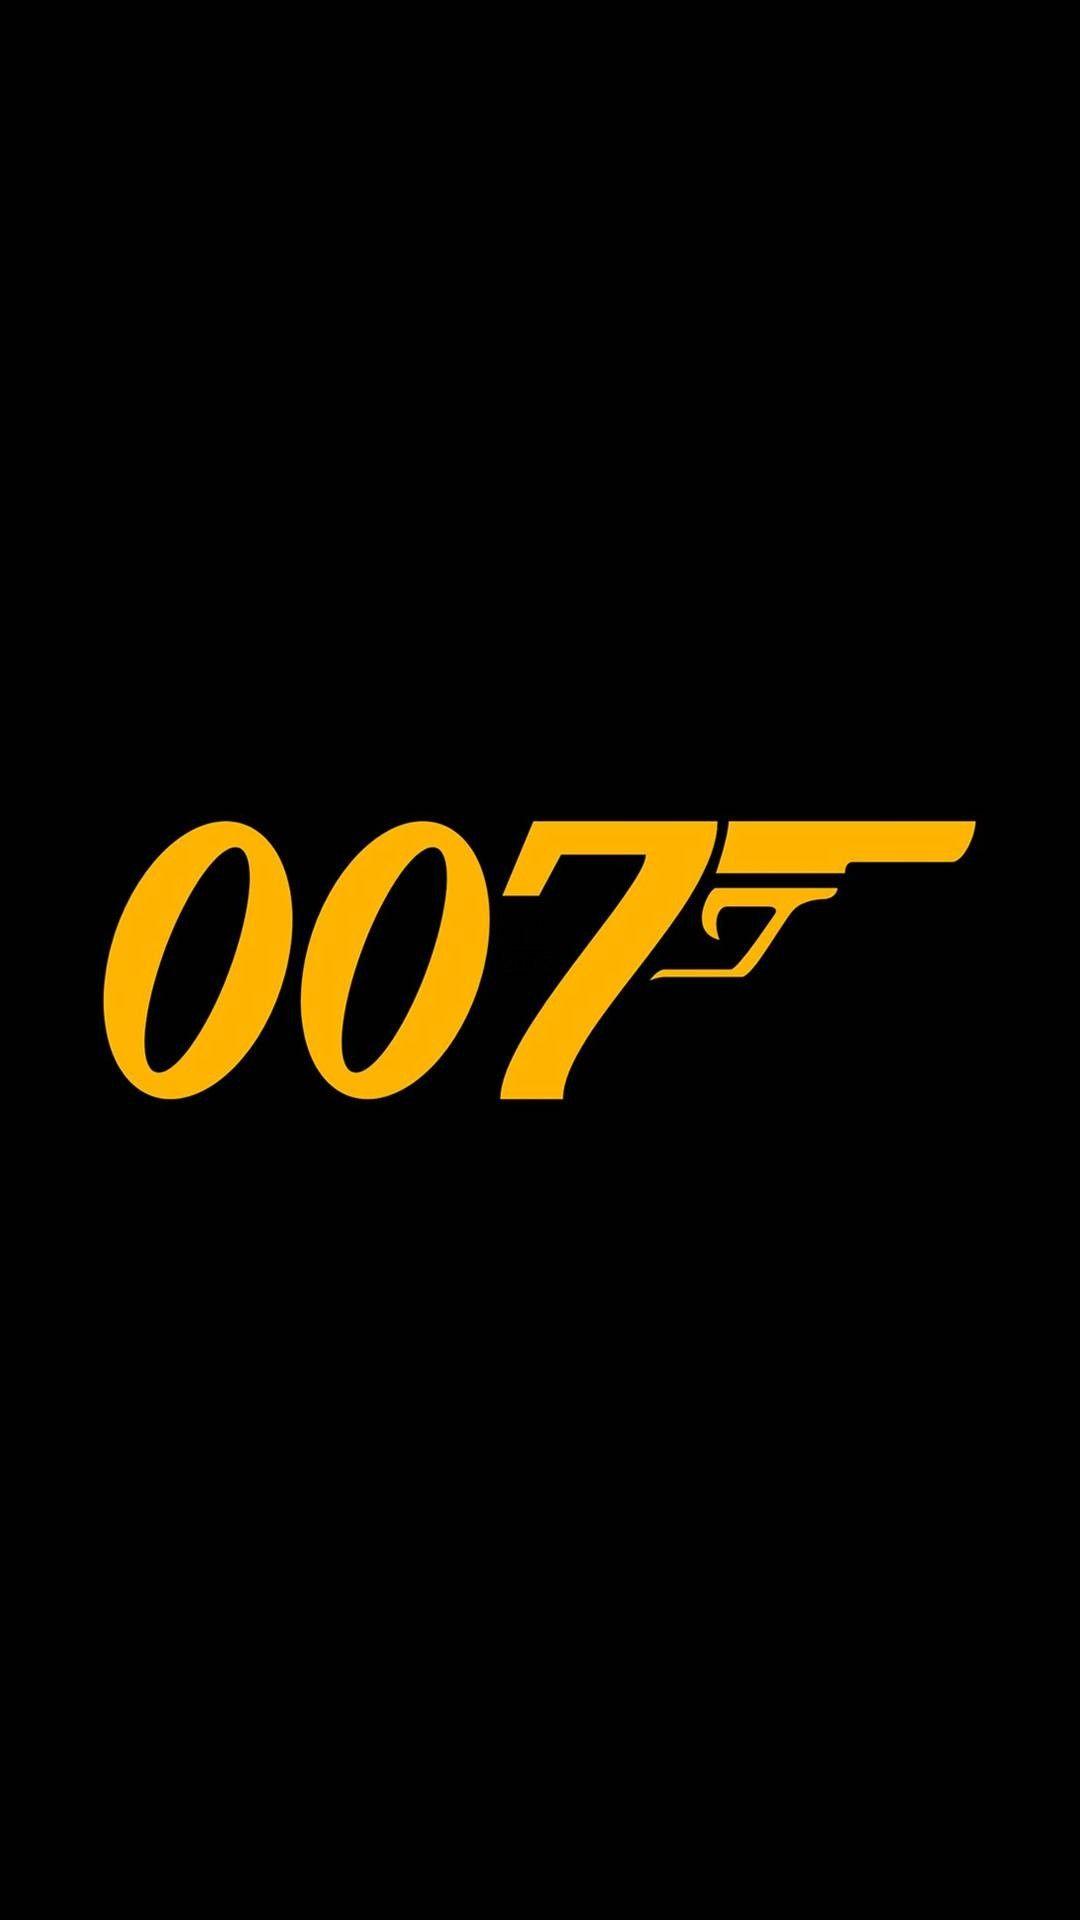 Pin By 中村純一 On 007 James Bond Movie Posters James Bond James Bond Movies